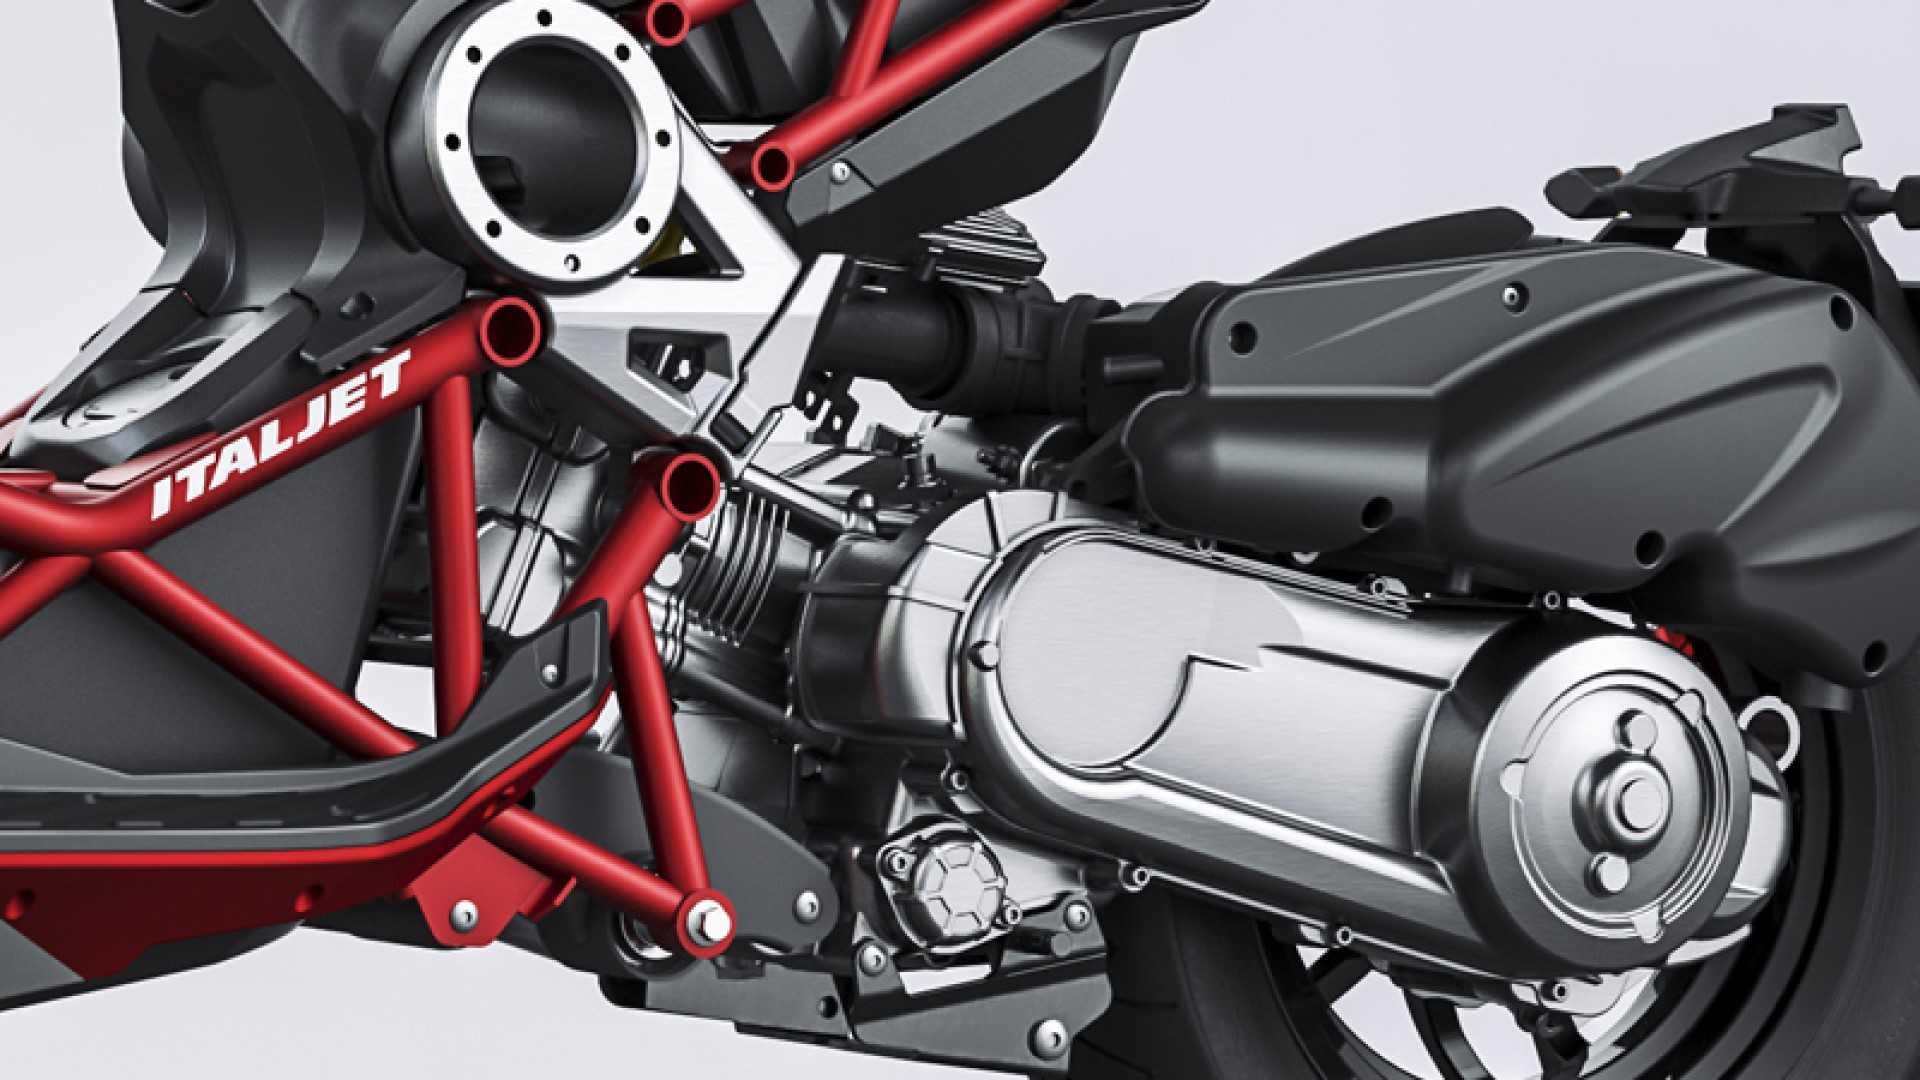 2019-italjet-dragster-10